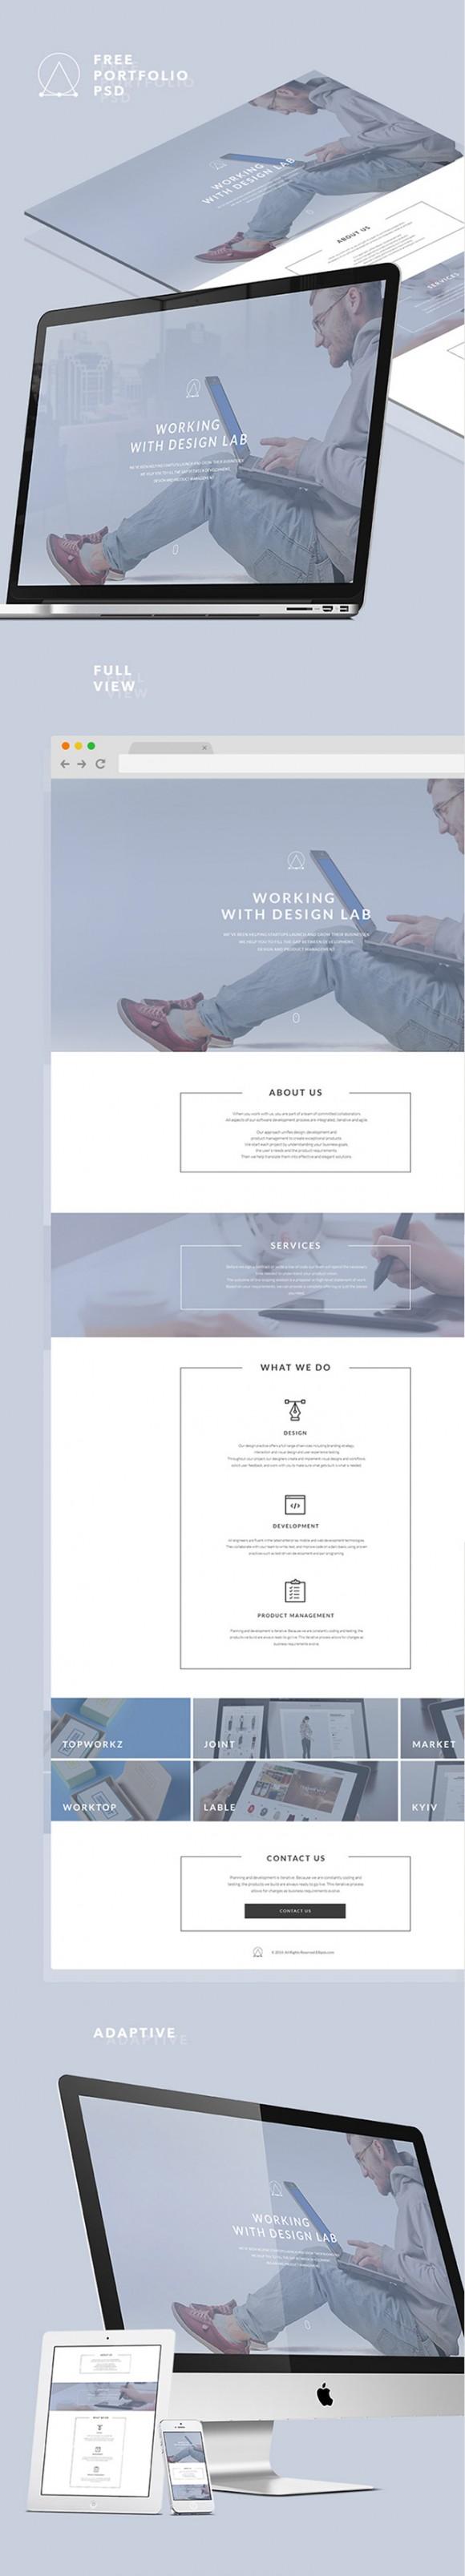 Elipsis portfolio template - Full view